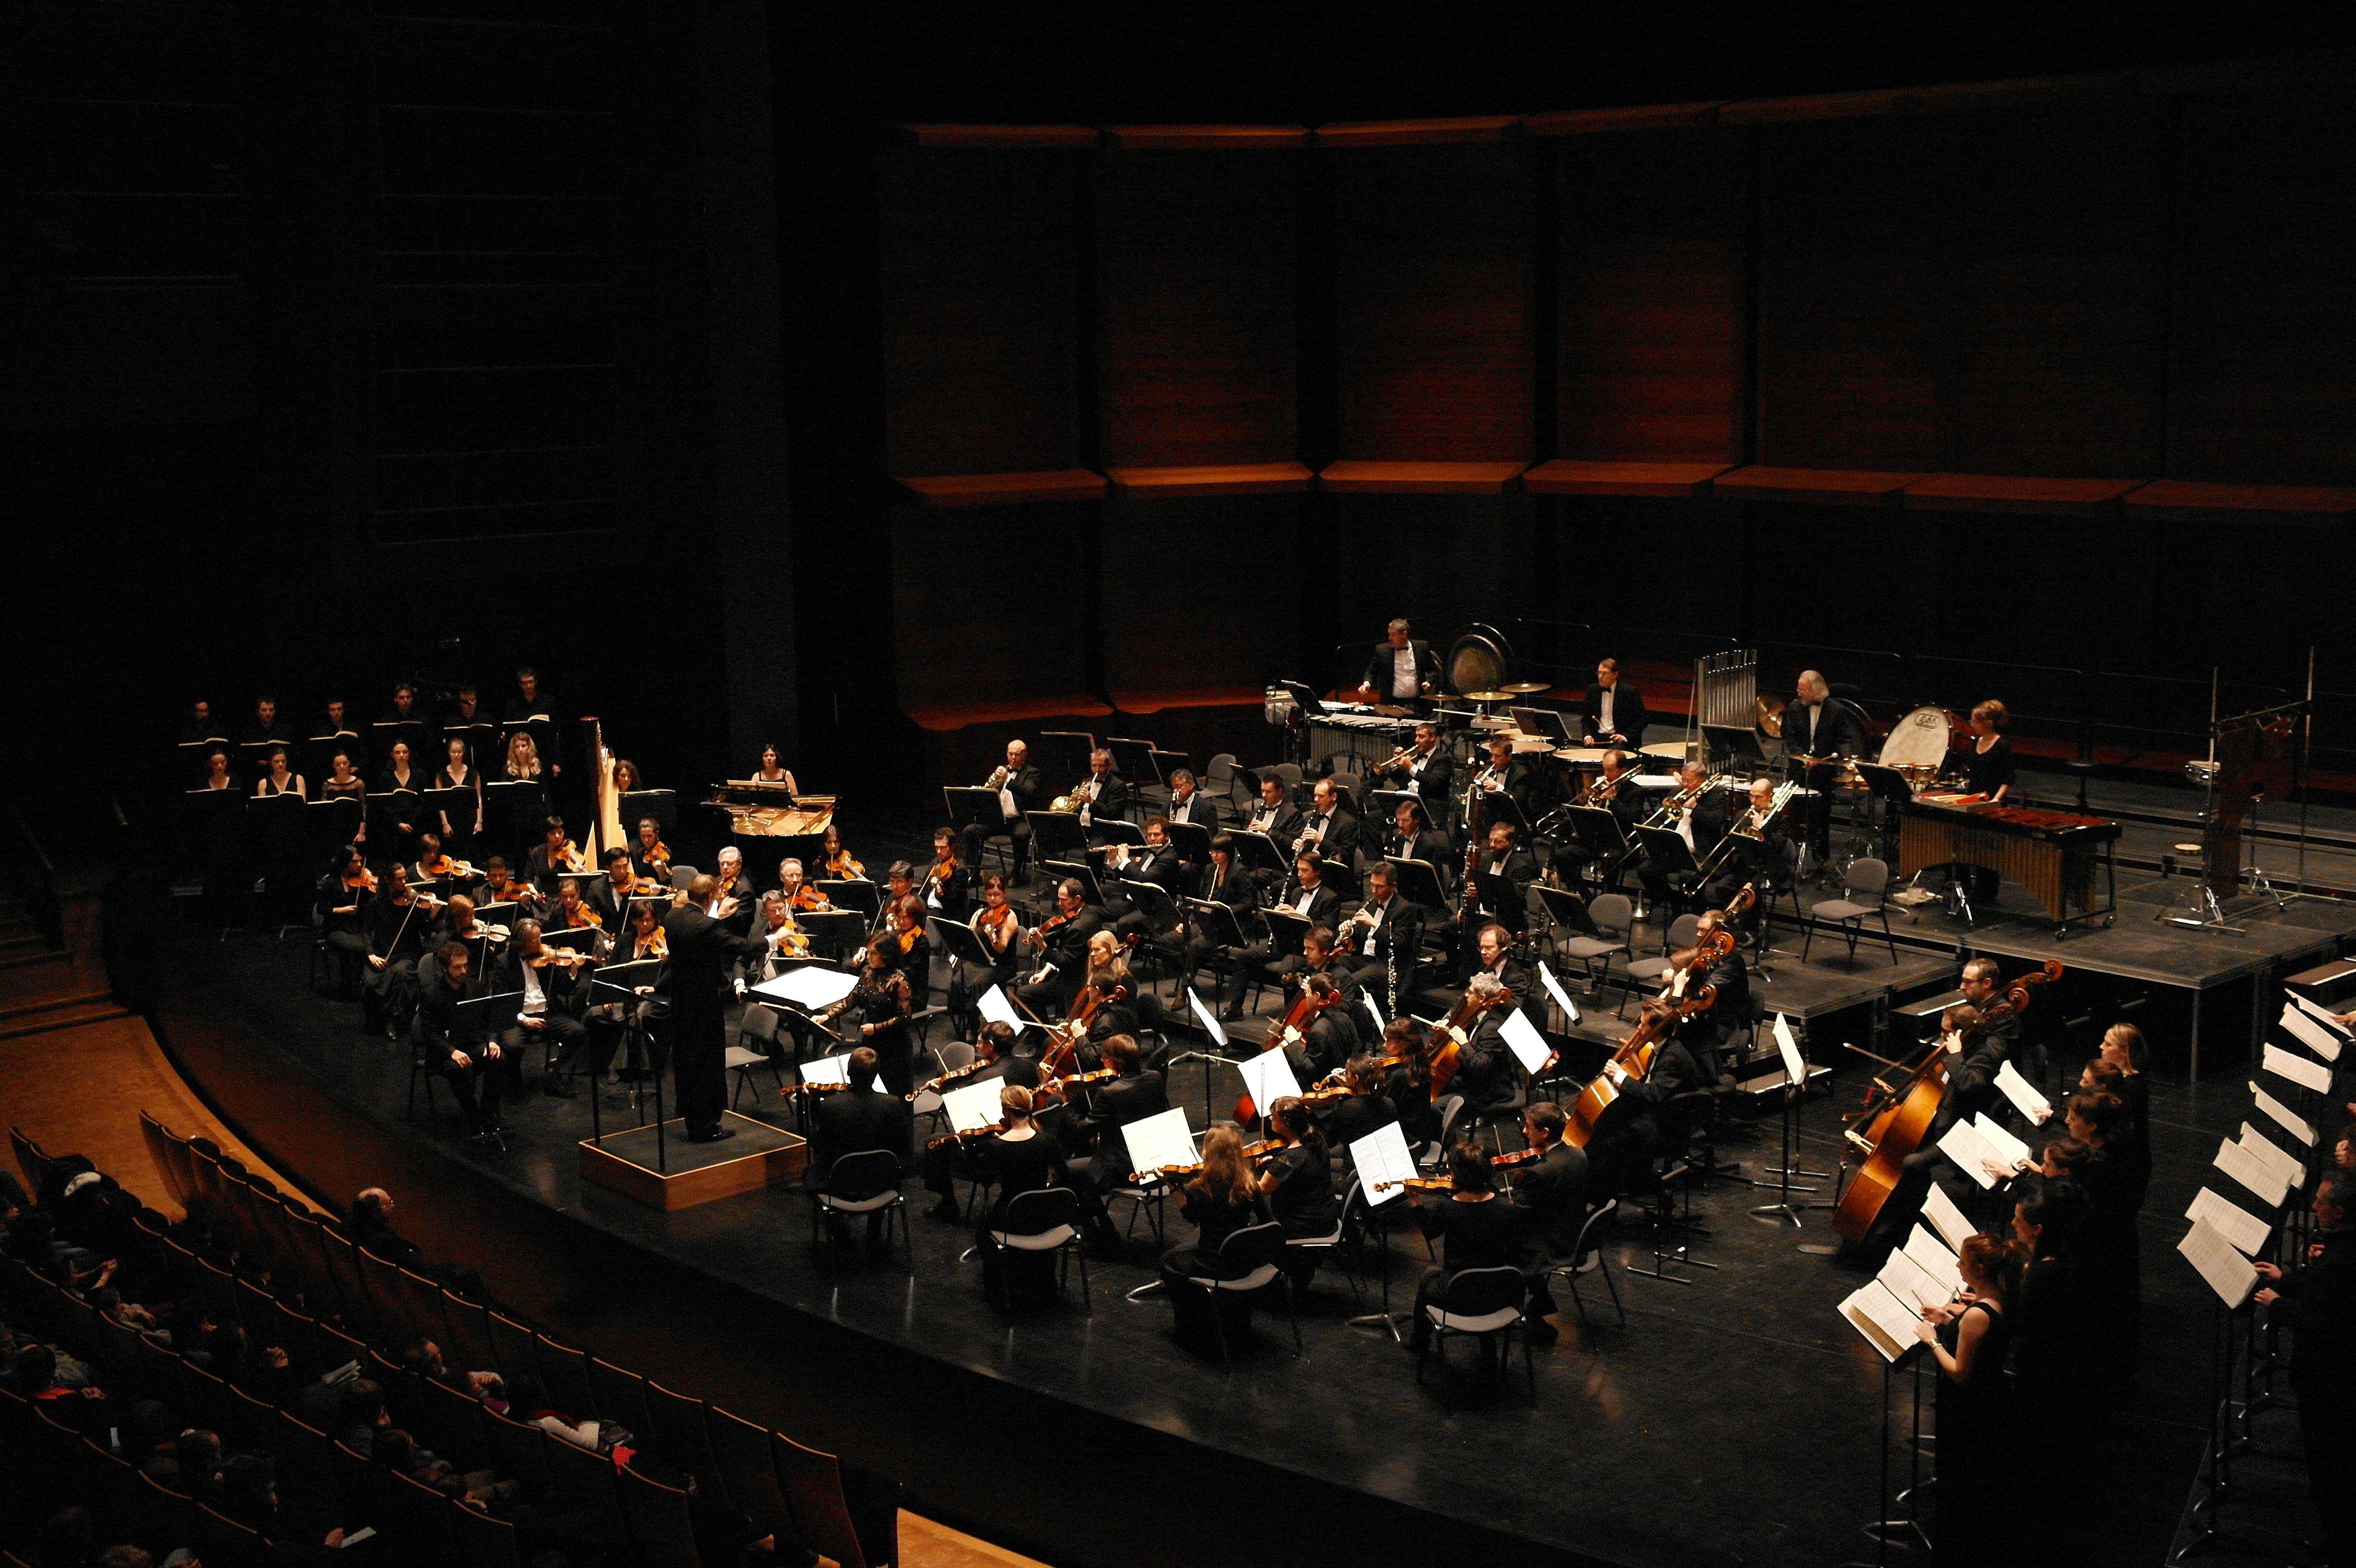 L'orchestre Dijon Bourgogne (c) Gérard Cunin